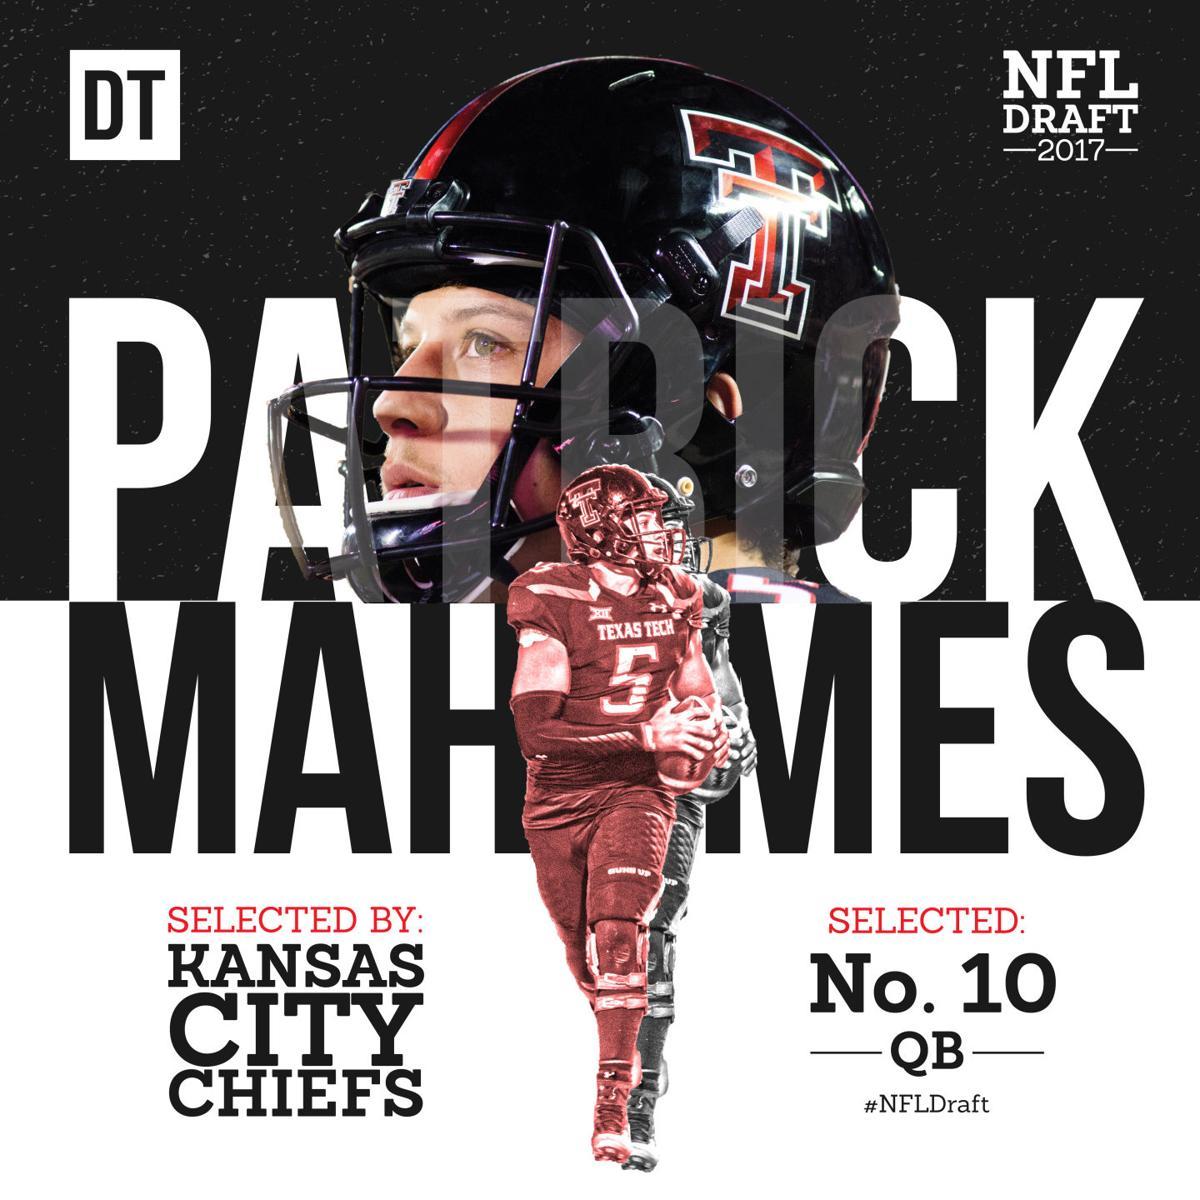 Patrick Mahomes Chiefs Iphone Wallpaper: Mahomes Starts New With Kansas City Chiefs